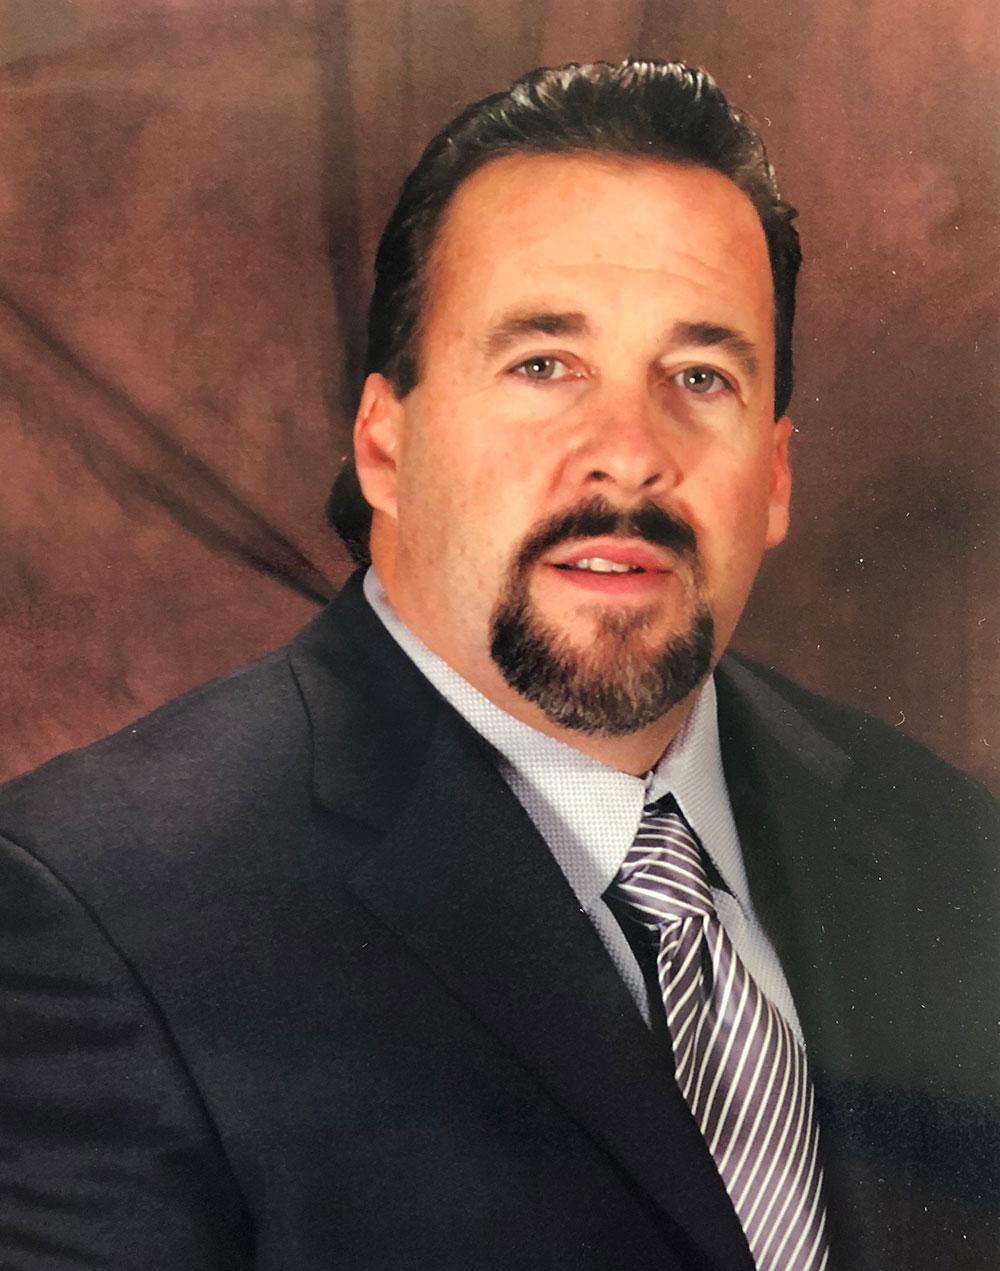 Robert McBride - President - Business Consultant